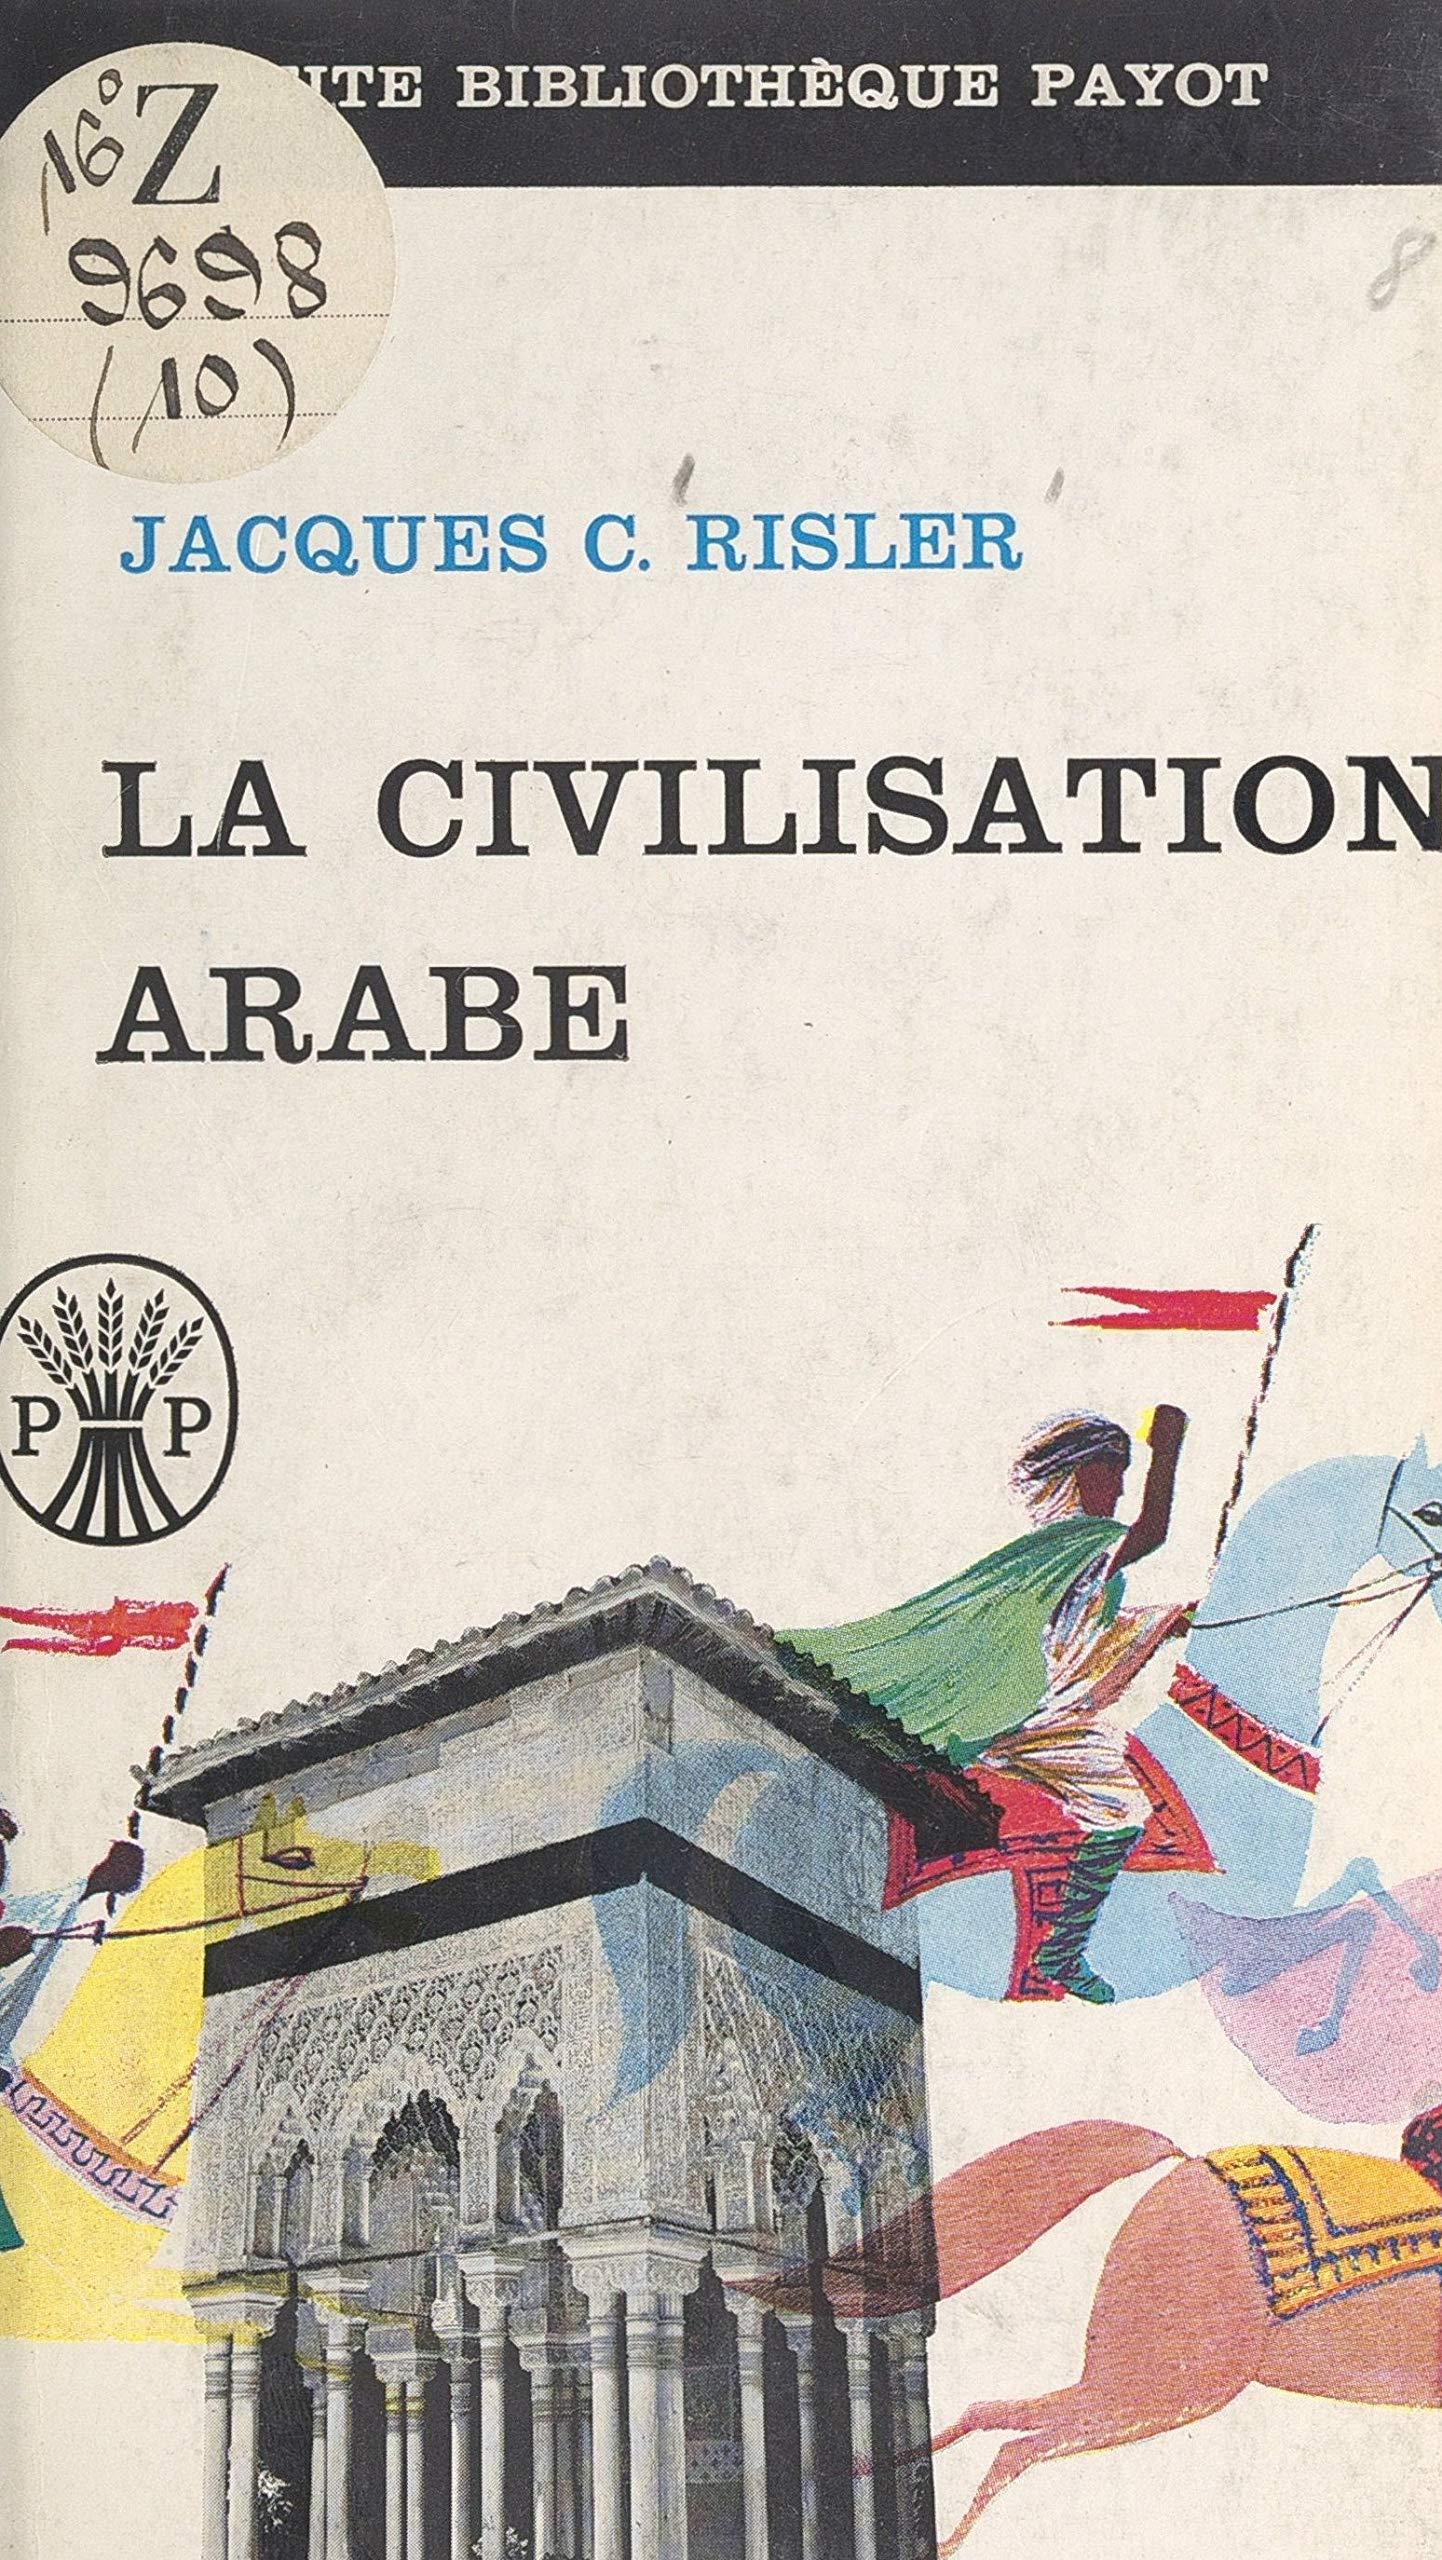 La civilisation arabe